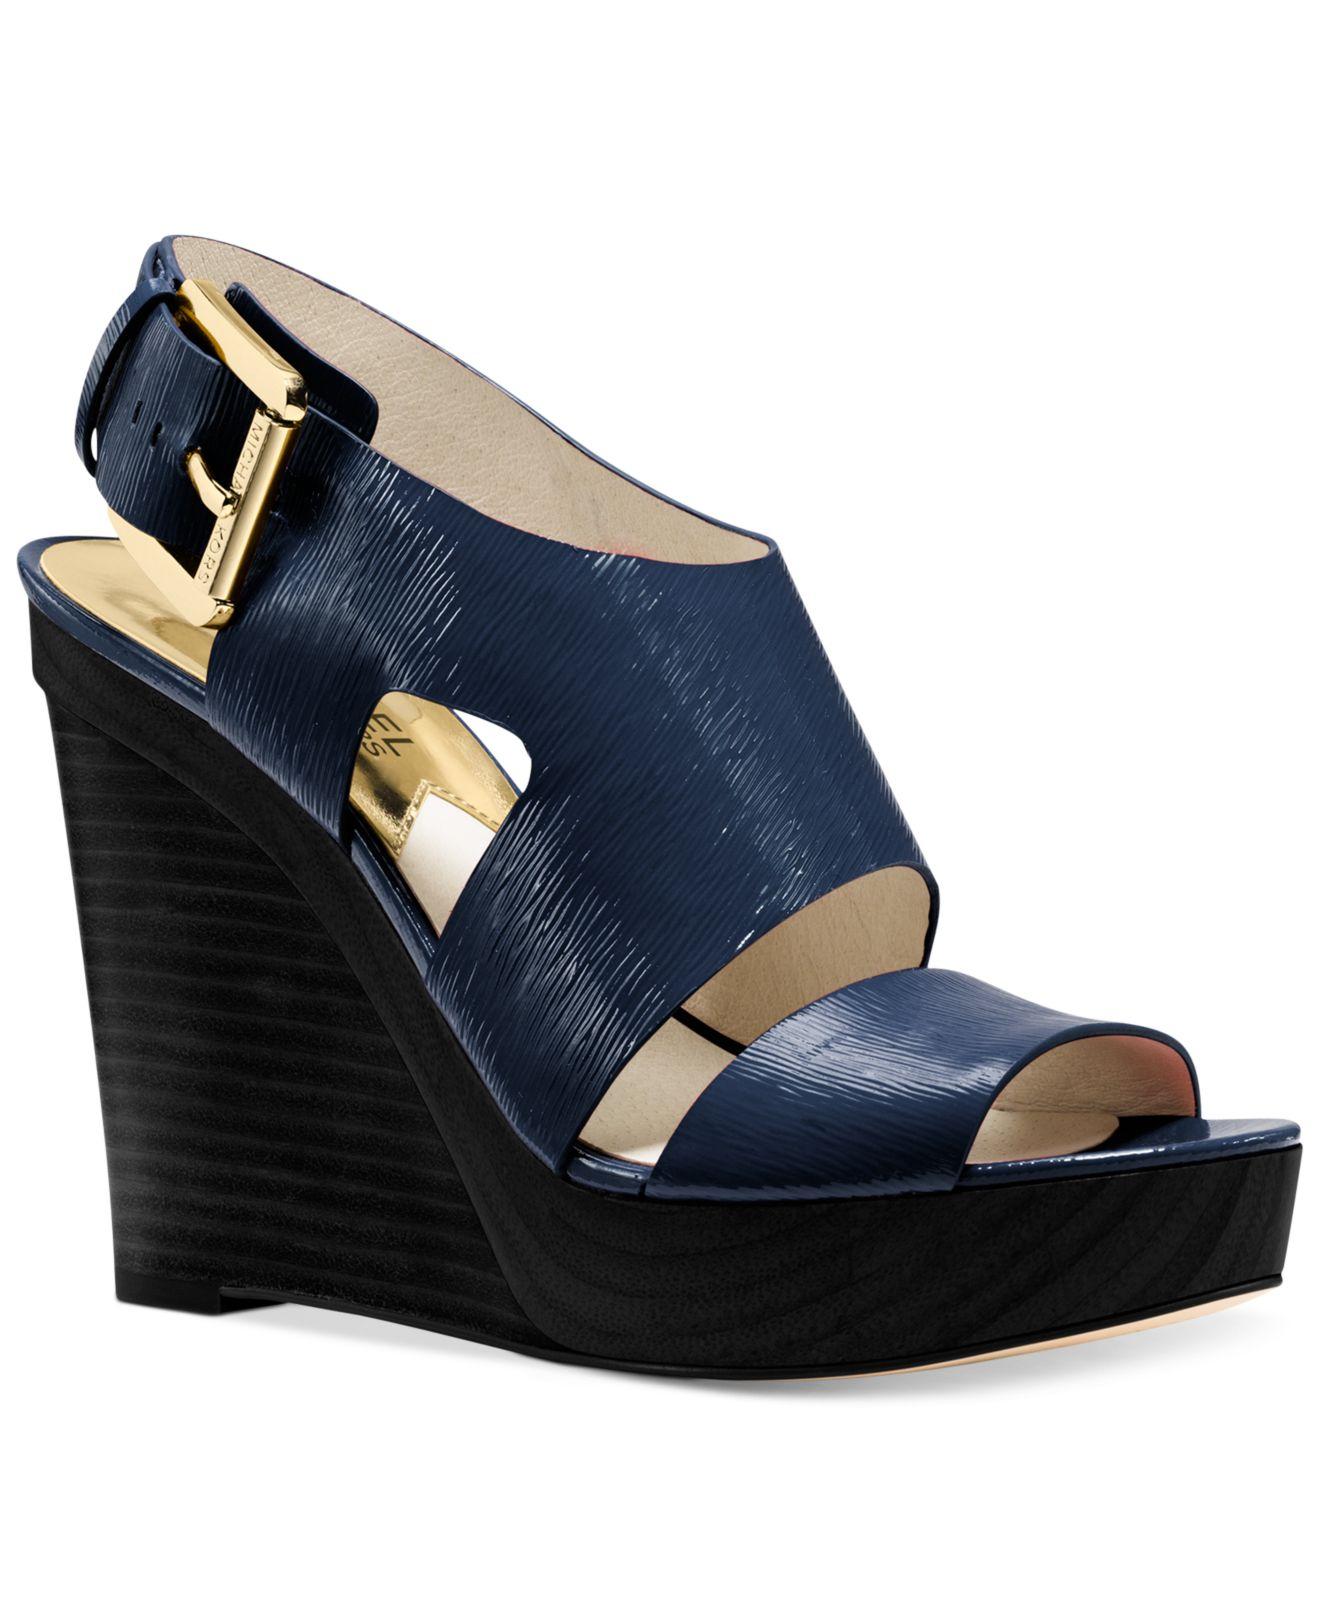 acf47ccfb1f3 Lyst - Michael Kors Michael Carla Platform Wedge Sandals in Blue